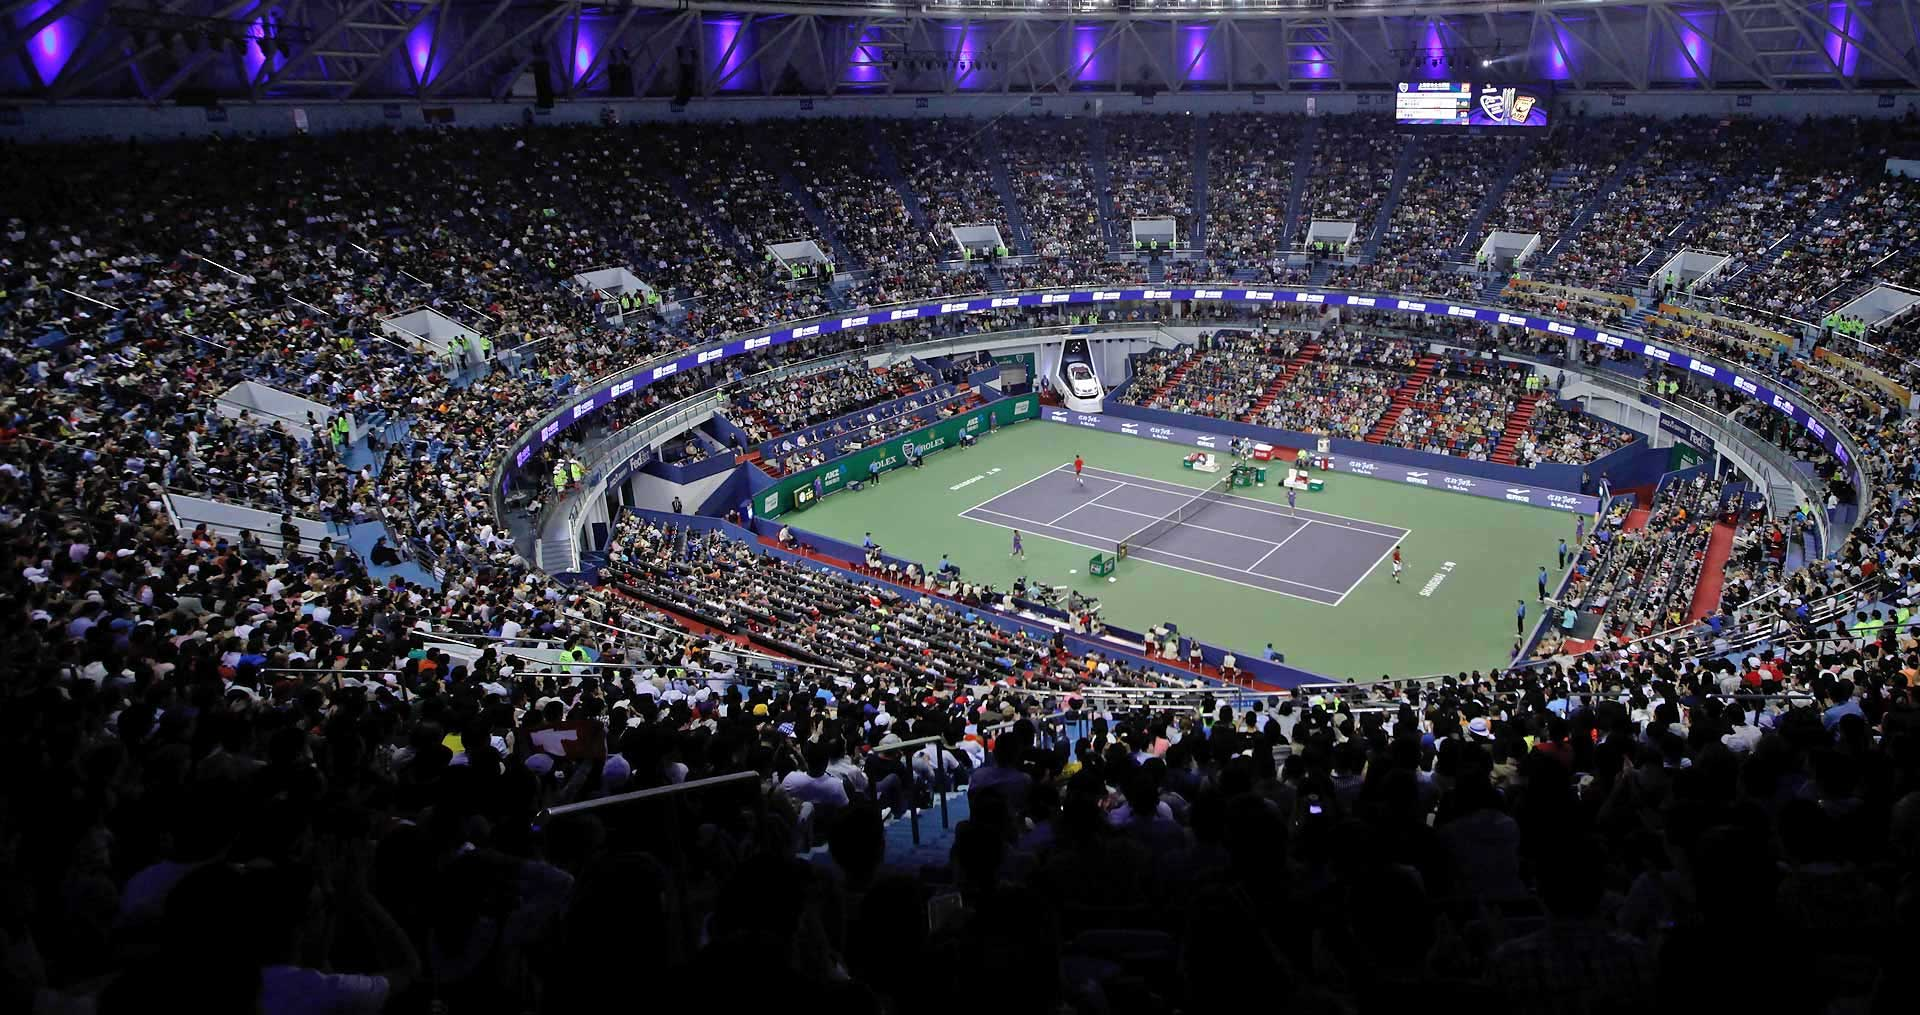 Shanghai Rolex Masters Tournaments banner ilikevents